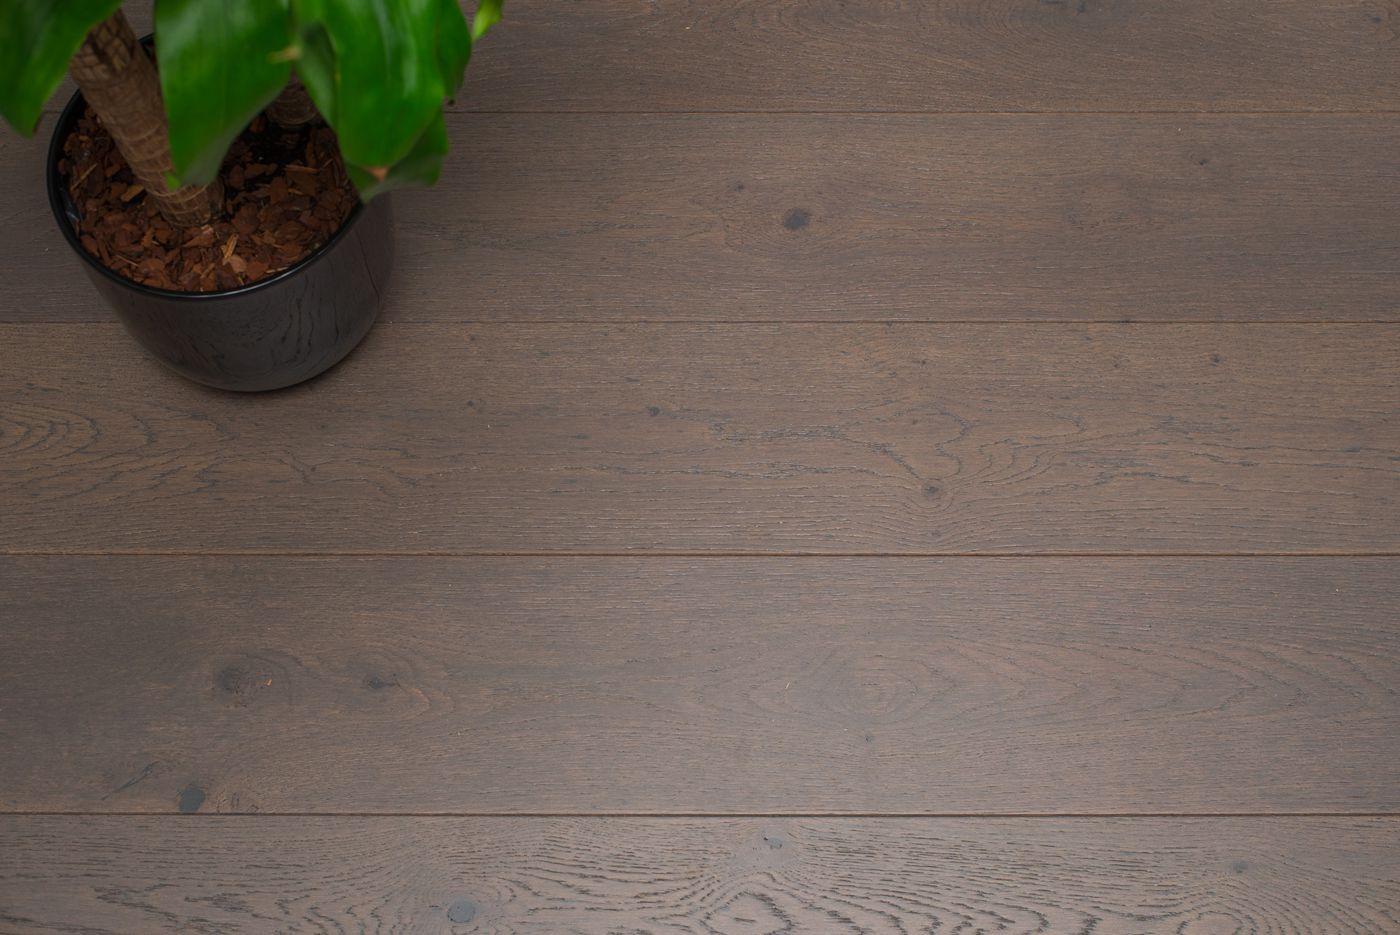 Houten Vloer Grijs : Fesca grijze eiken duoplank parket vloeren grijs eik hout vloer